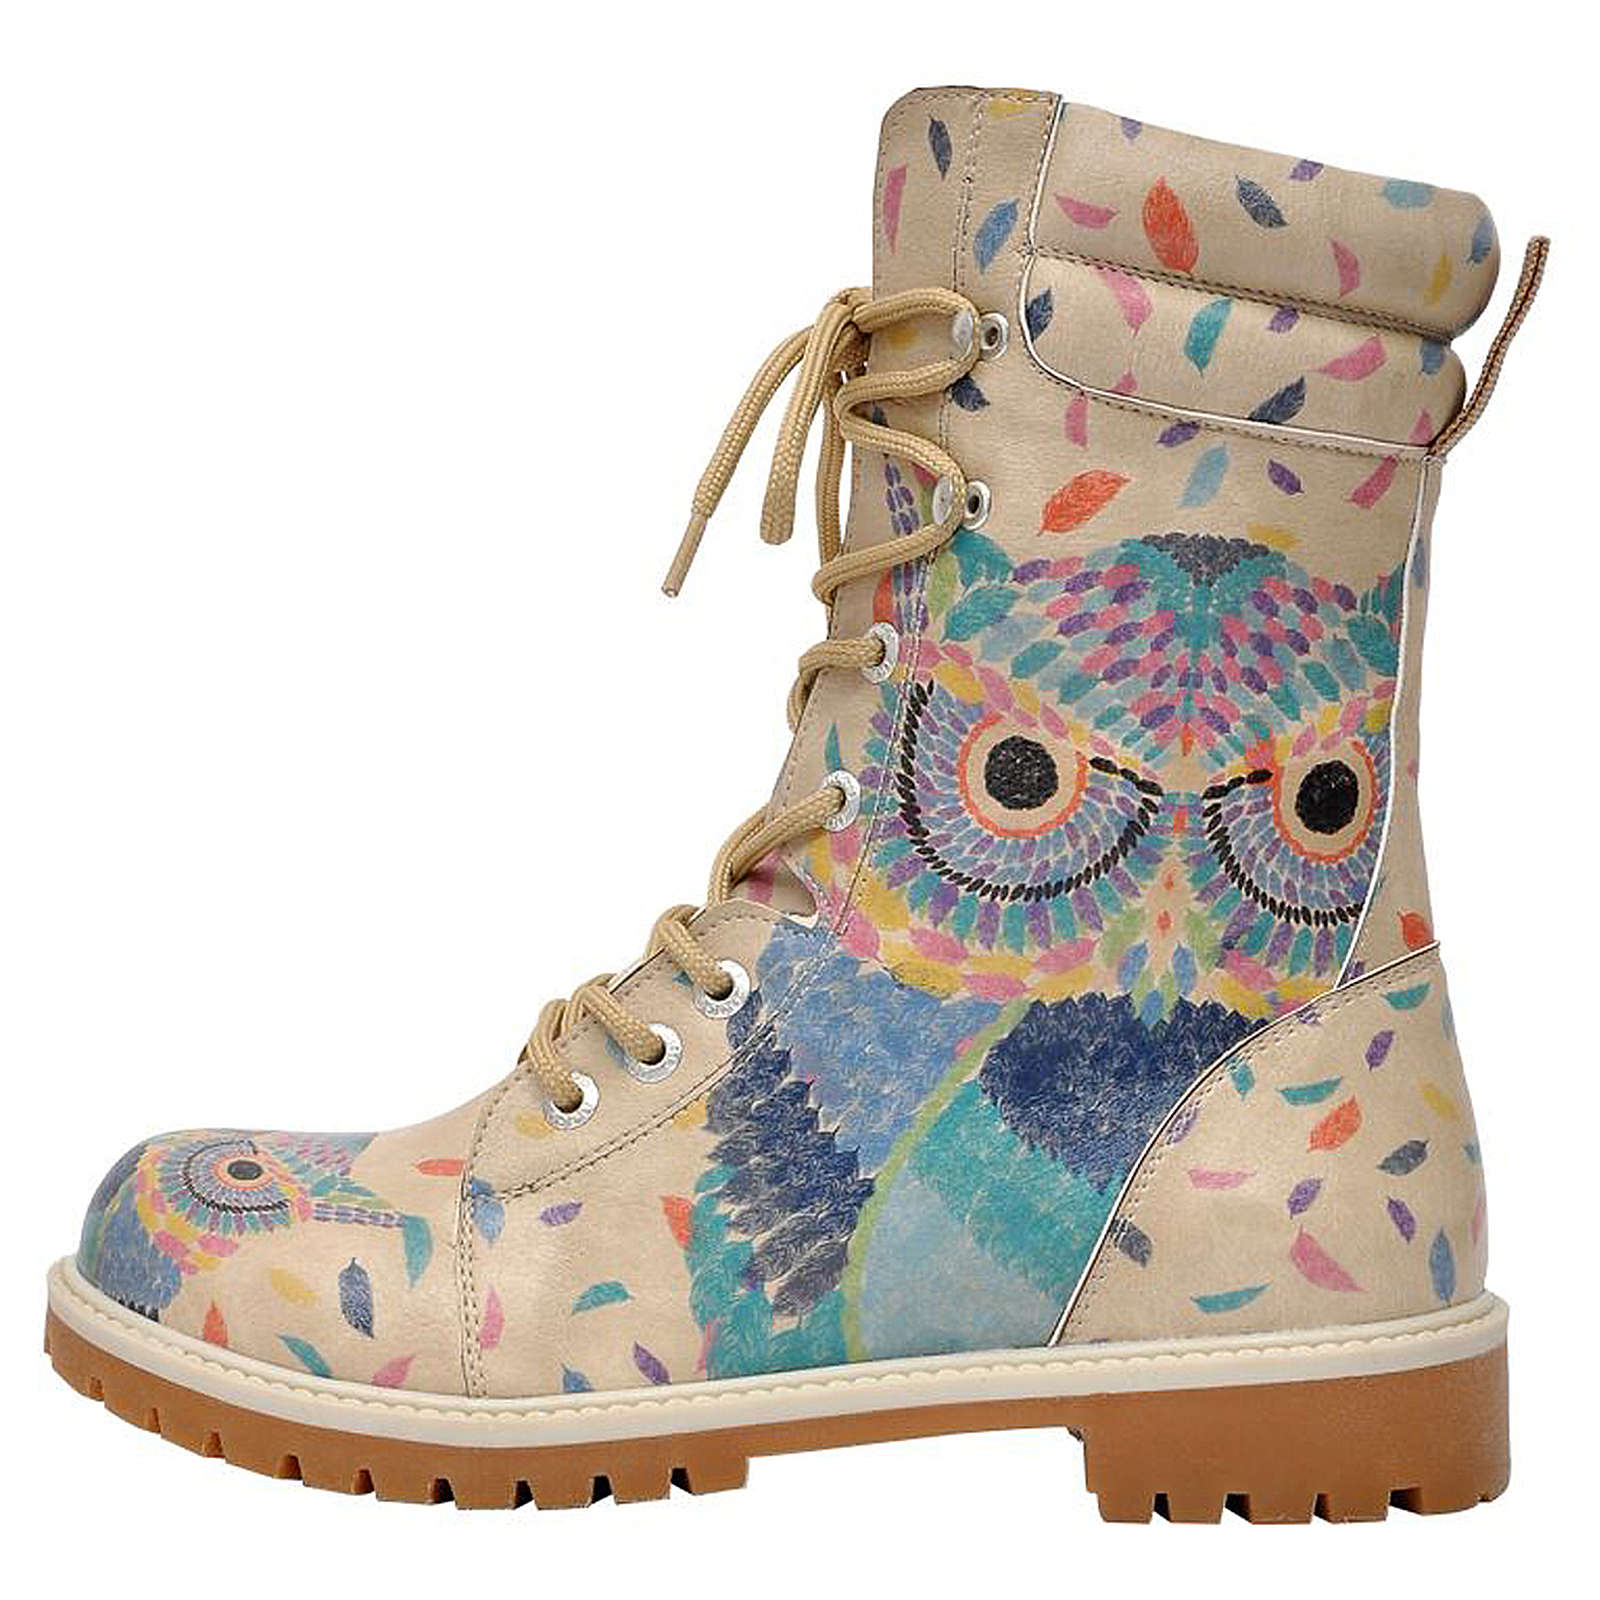 Dogo Shoes Schnürstiefel Super Boots mehrfarbig...